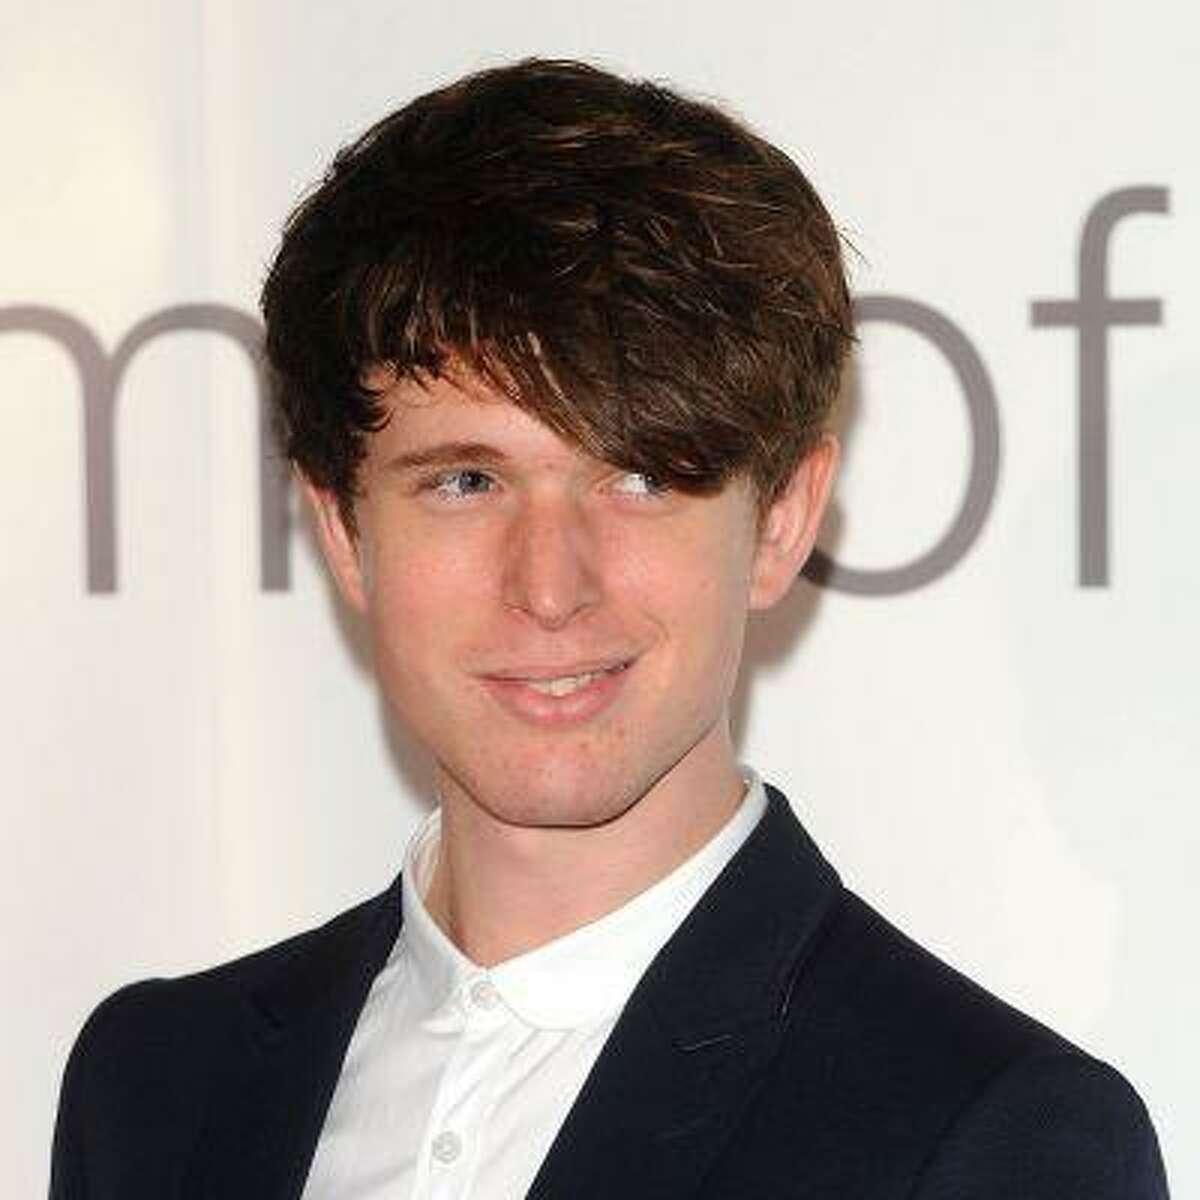 James Blake Barclaycard Mercury Prize Awards 2011 held at Grosvenor House - Arrivals London, England - 06.09.11 Mandatory Credit: WENN.com